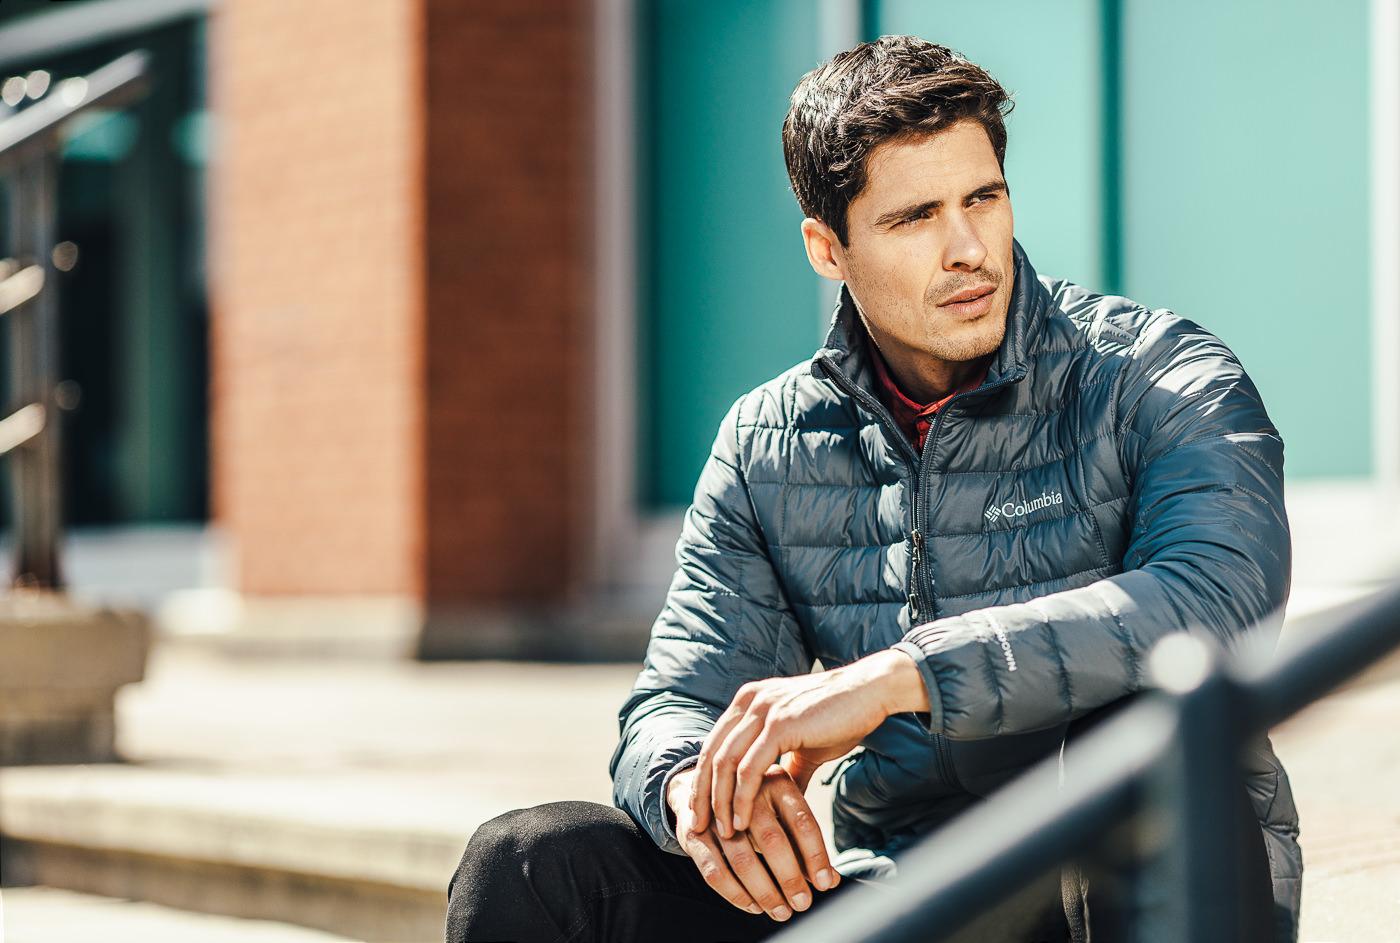 photo commercial sports experts camapagne manteau printemps urbain hommes